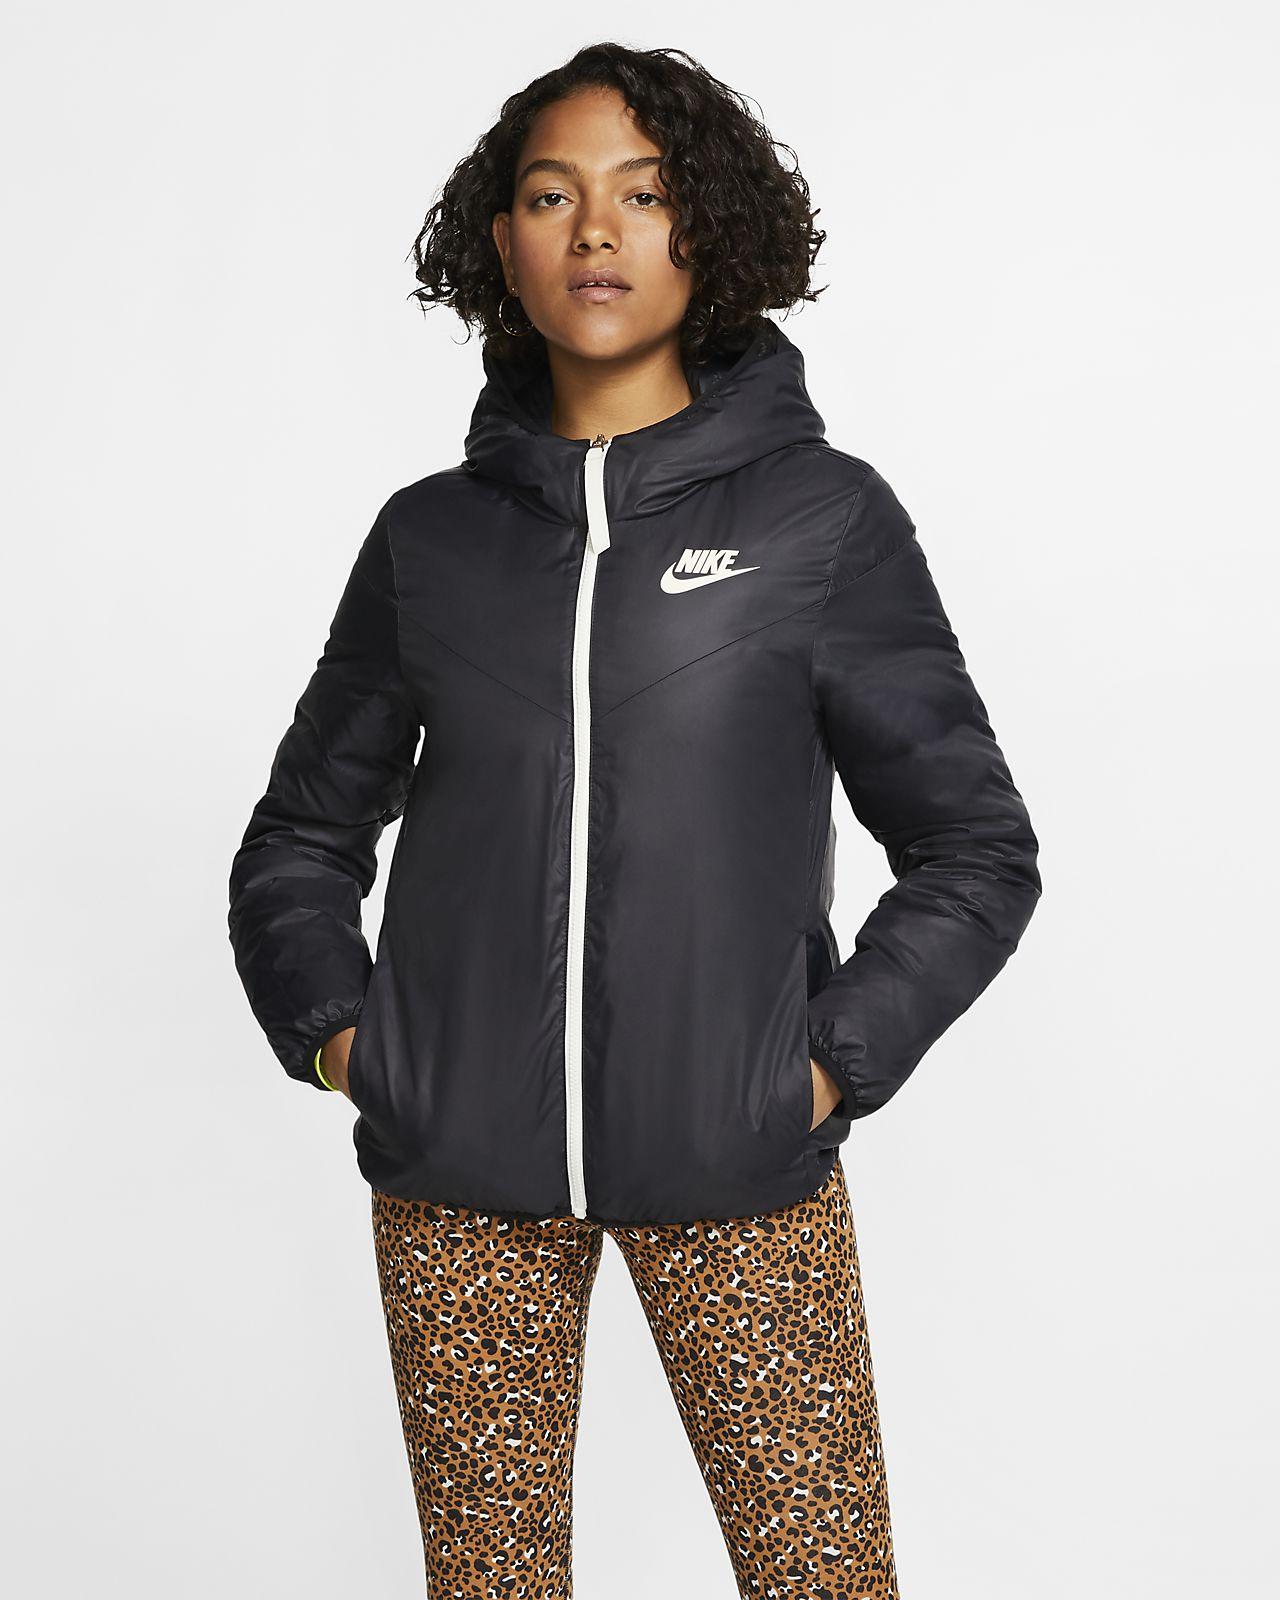 Windrunner Nike Down Jacket Fill Reversible Sportswear Women's VzqSGULMp